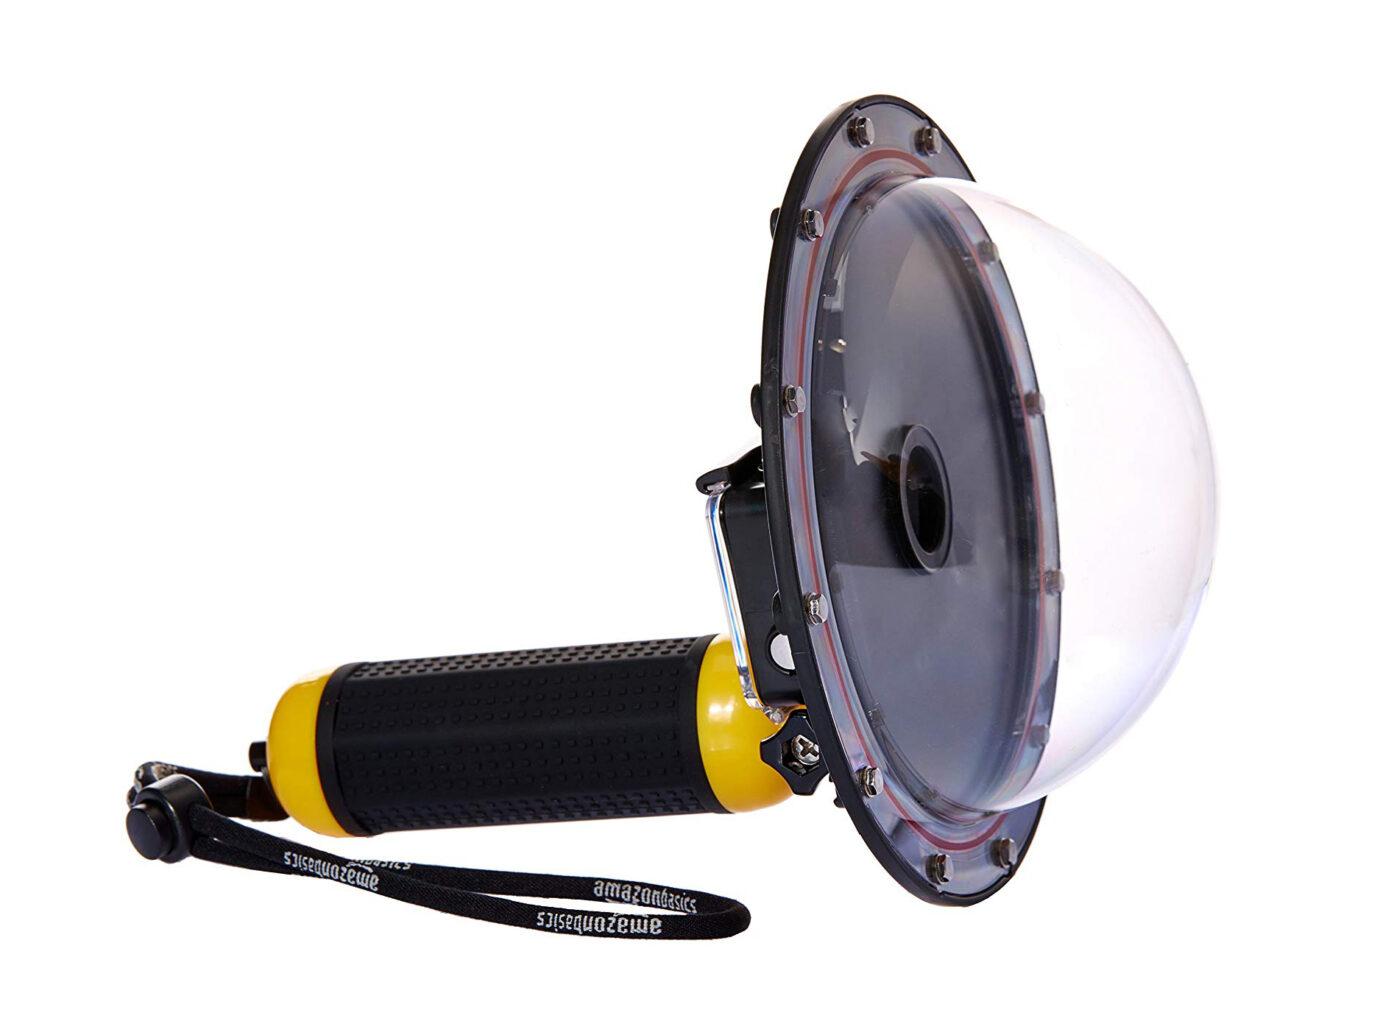 AmazonBasics Underwater Dome Port for GoPro